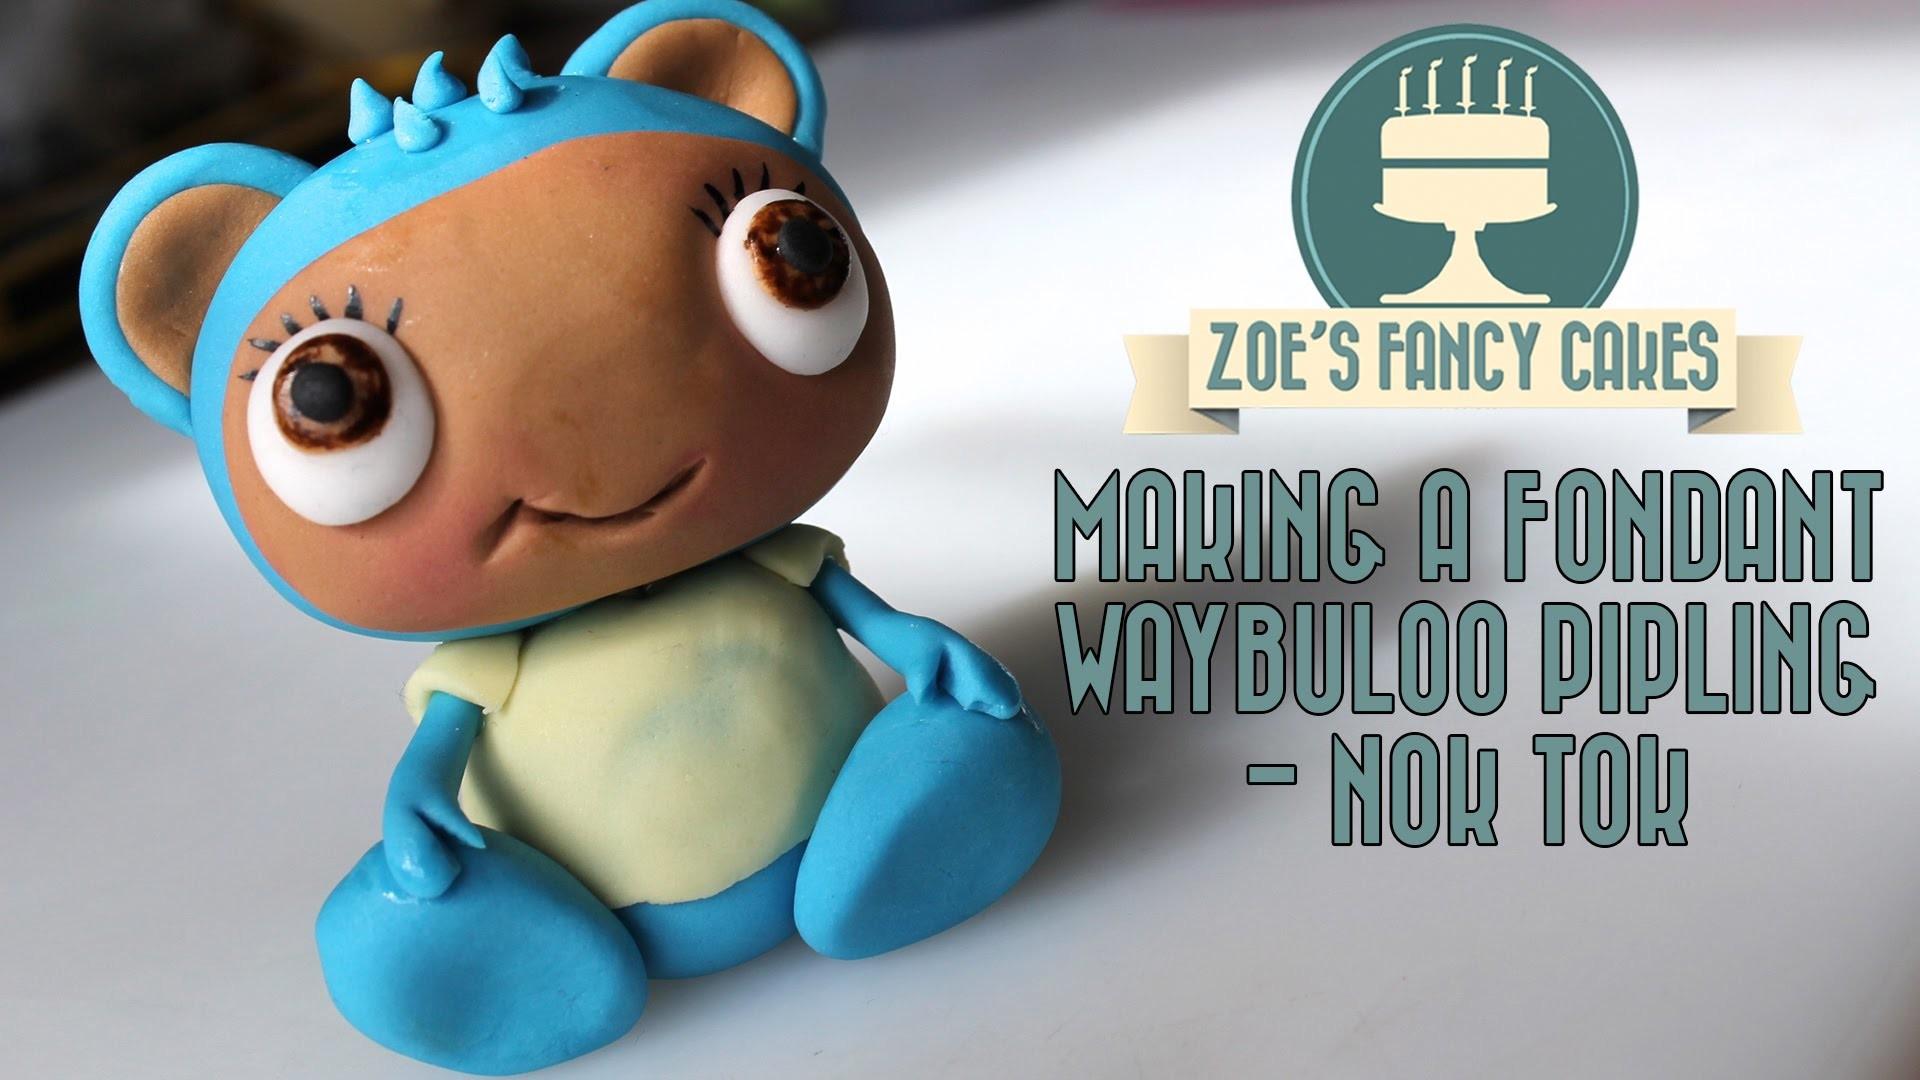 How to make a fondant waybuloo pipling Nok Tok (blue) How To Tutorial